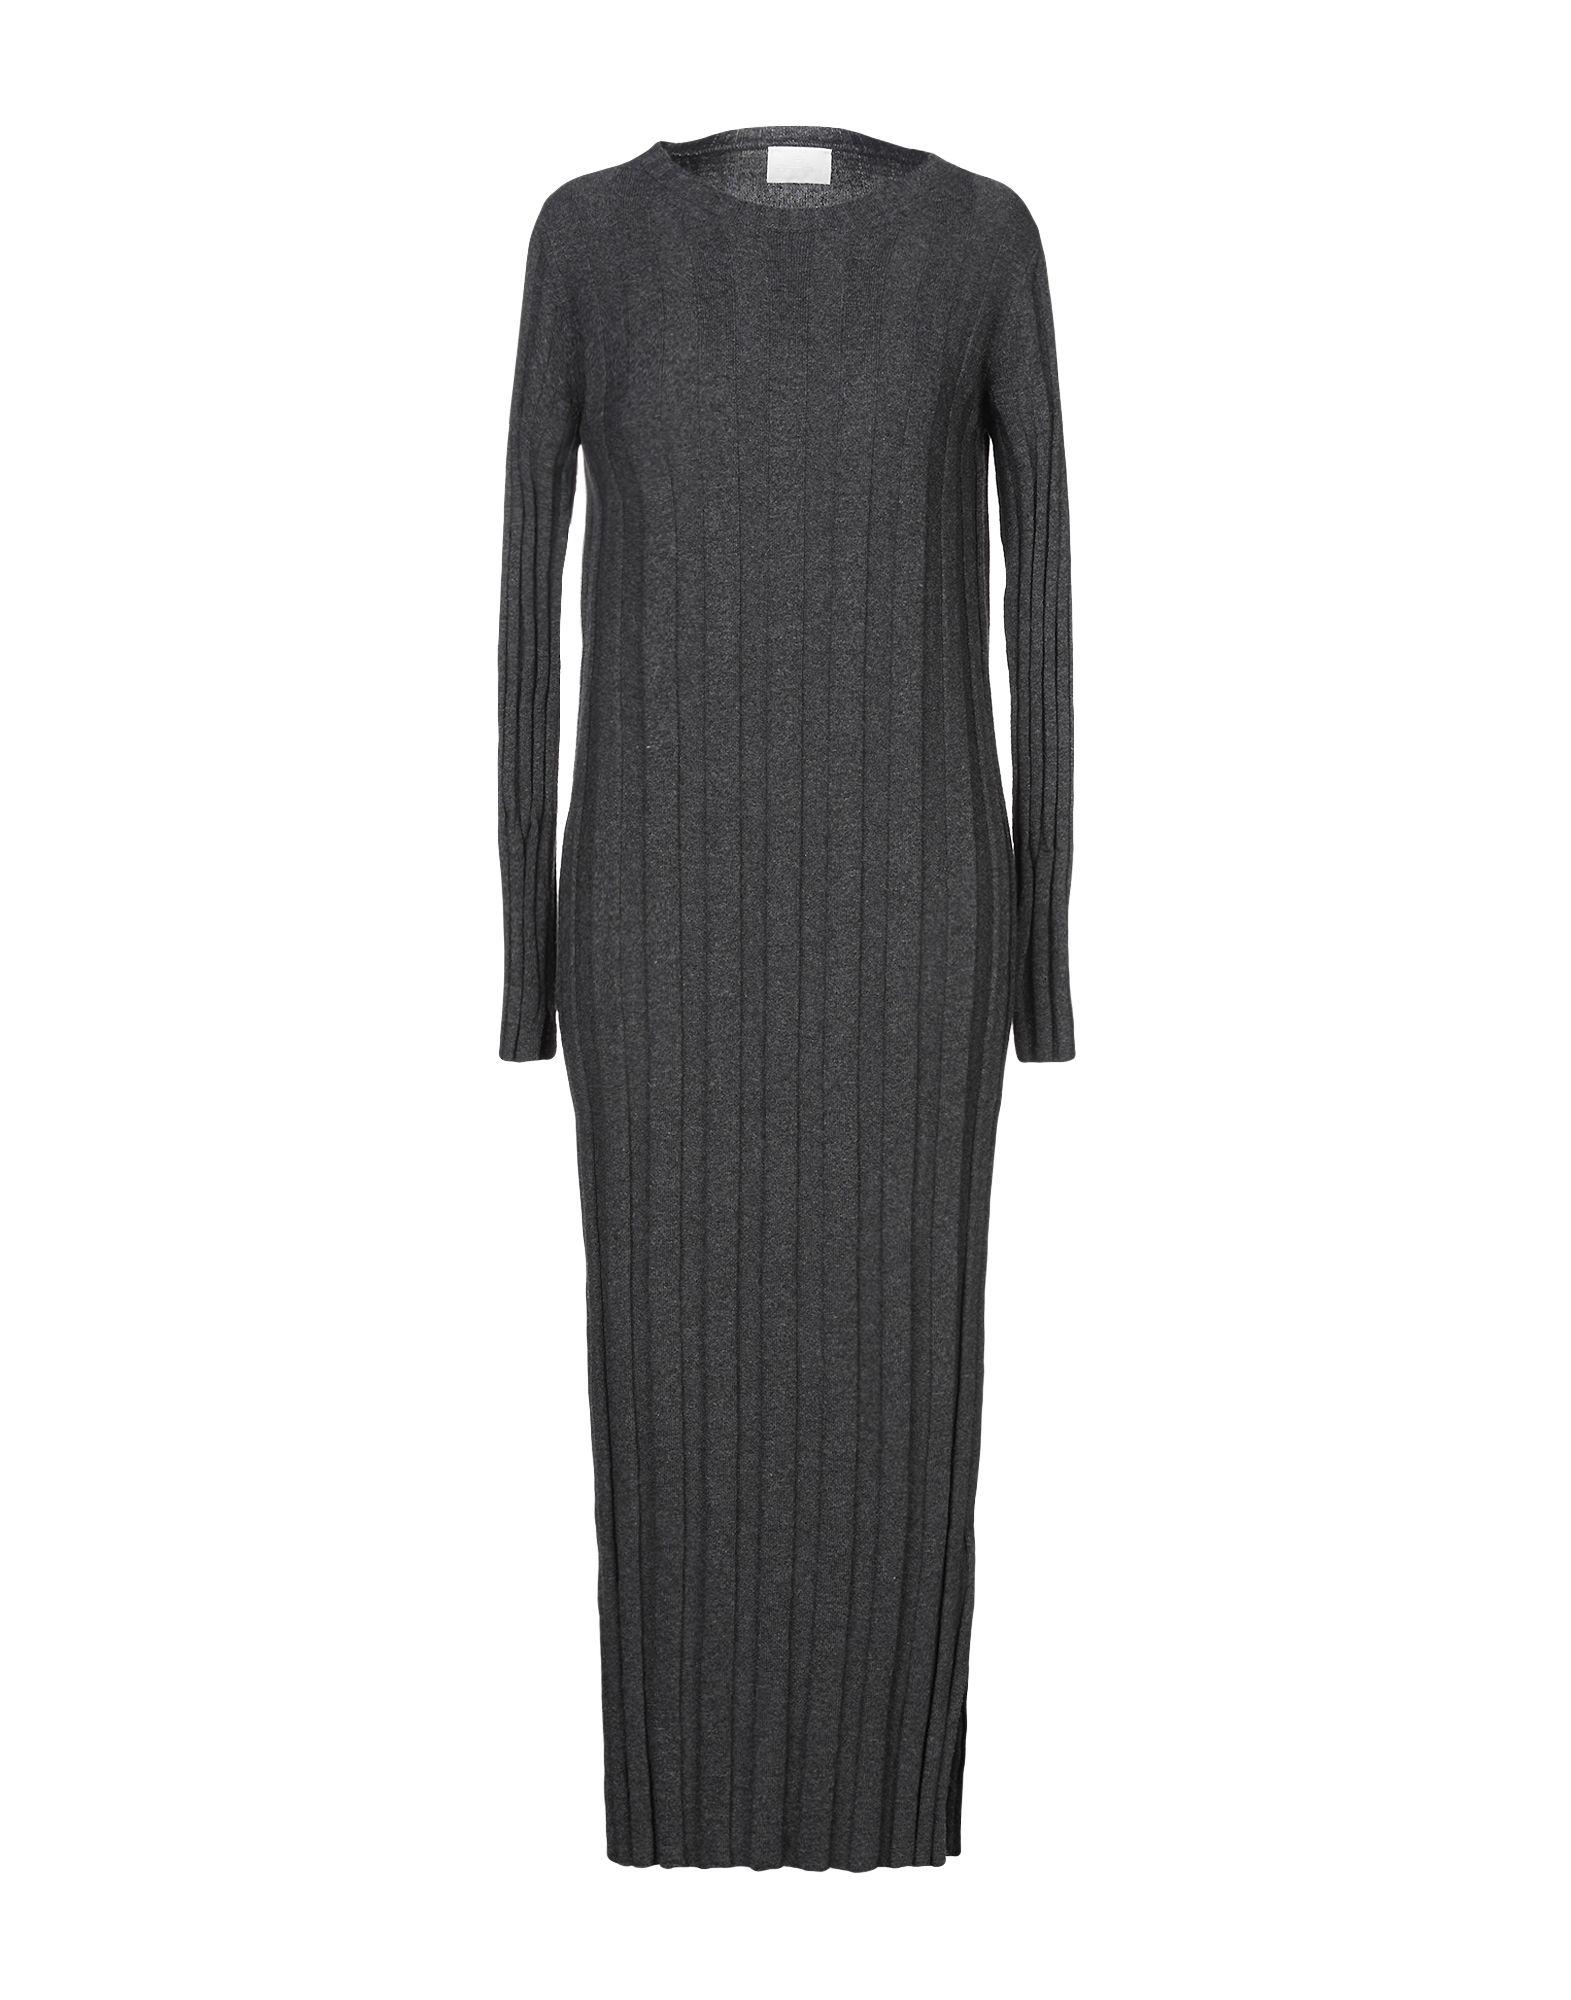 Vestito Longuette Gotha donna donna donna - 34950788EX 170